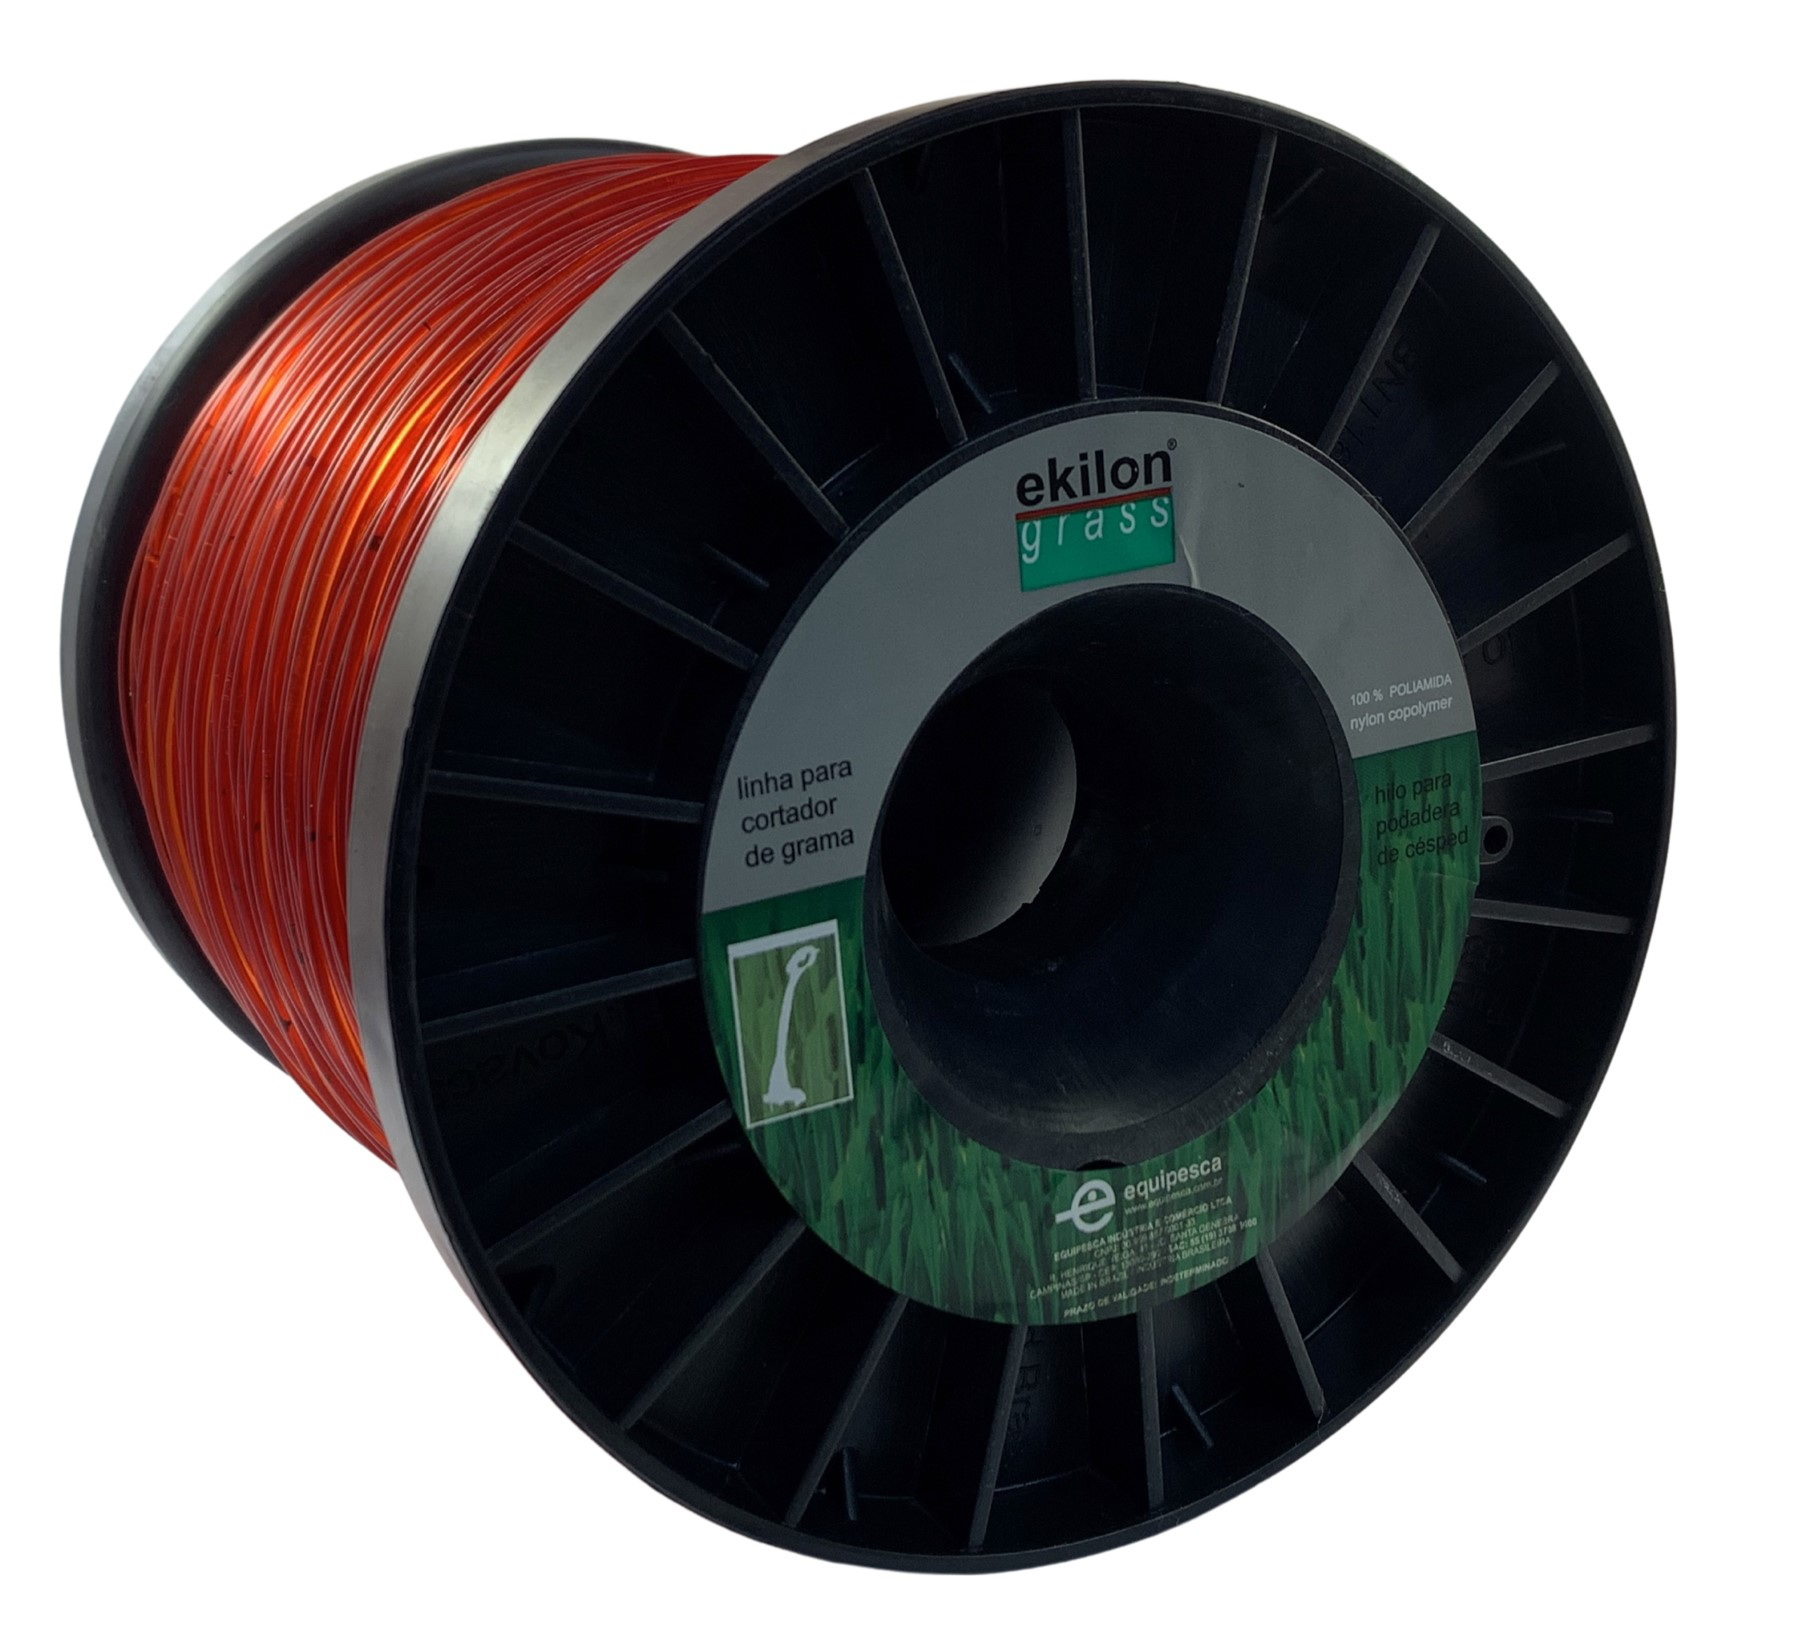 Fio De Nylon Vermelho 3mm Ekilon® Grass - 1 Kilo